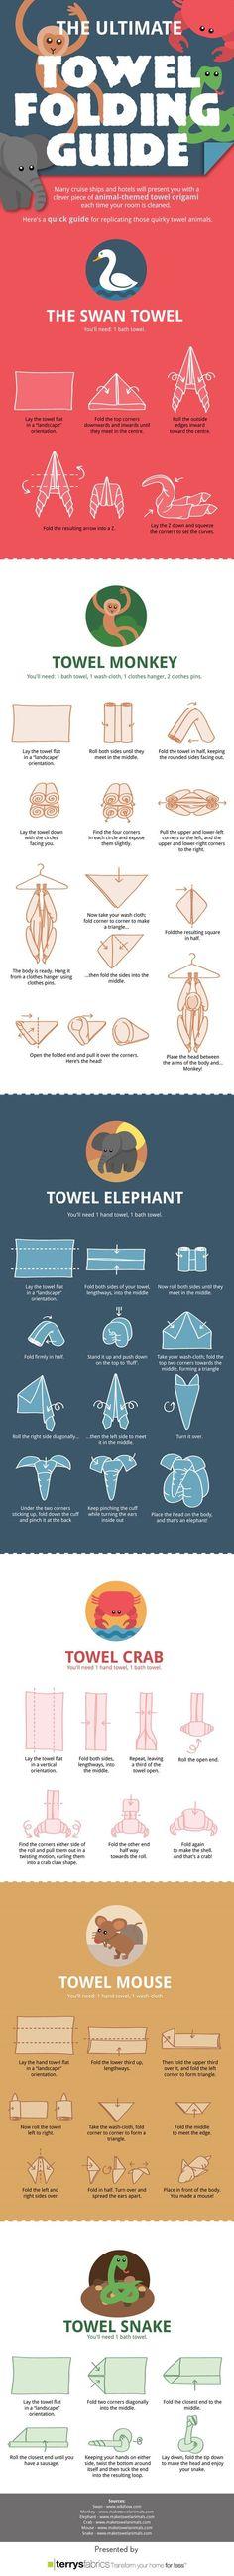 Impress Everyone! Follow This Ultimate Towel Folding Guide